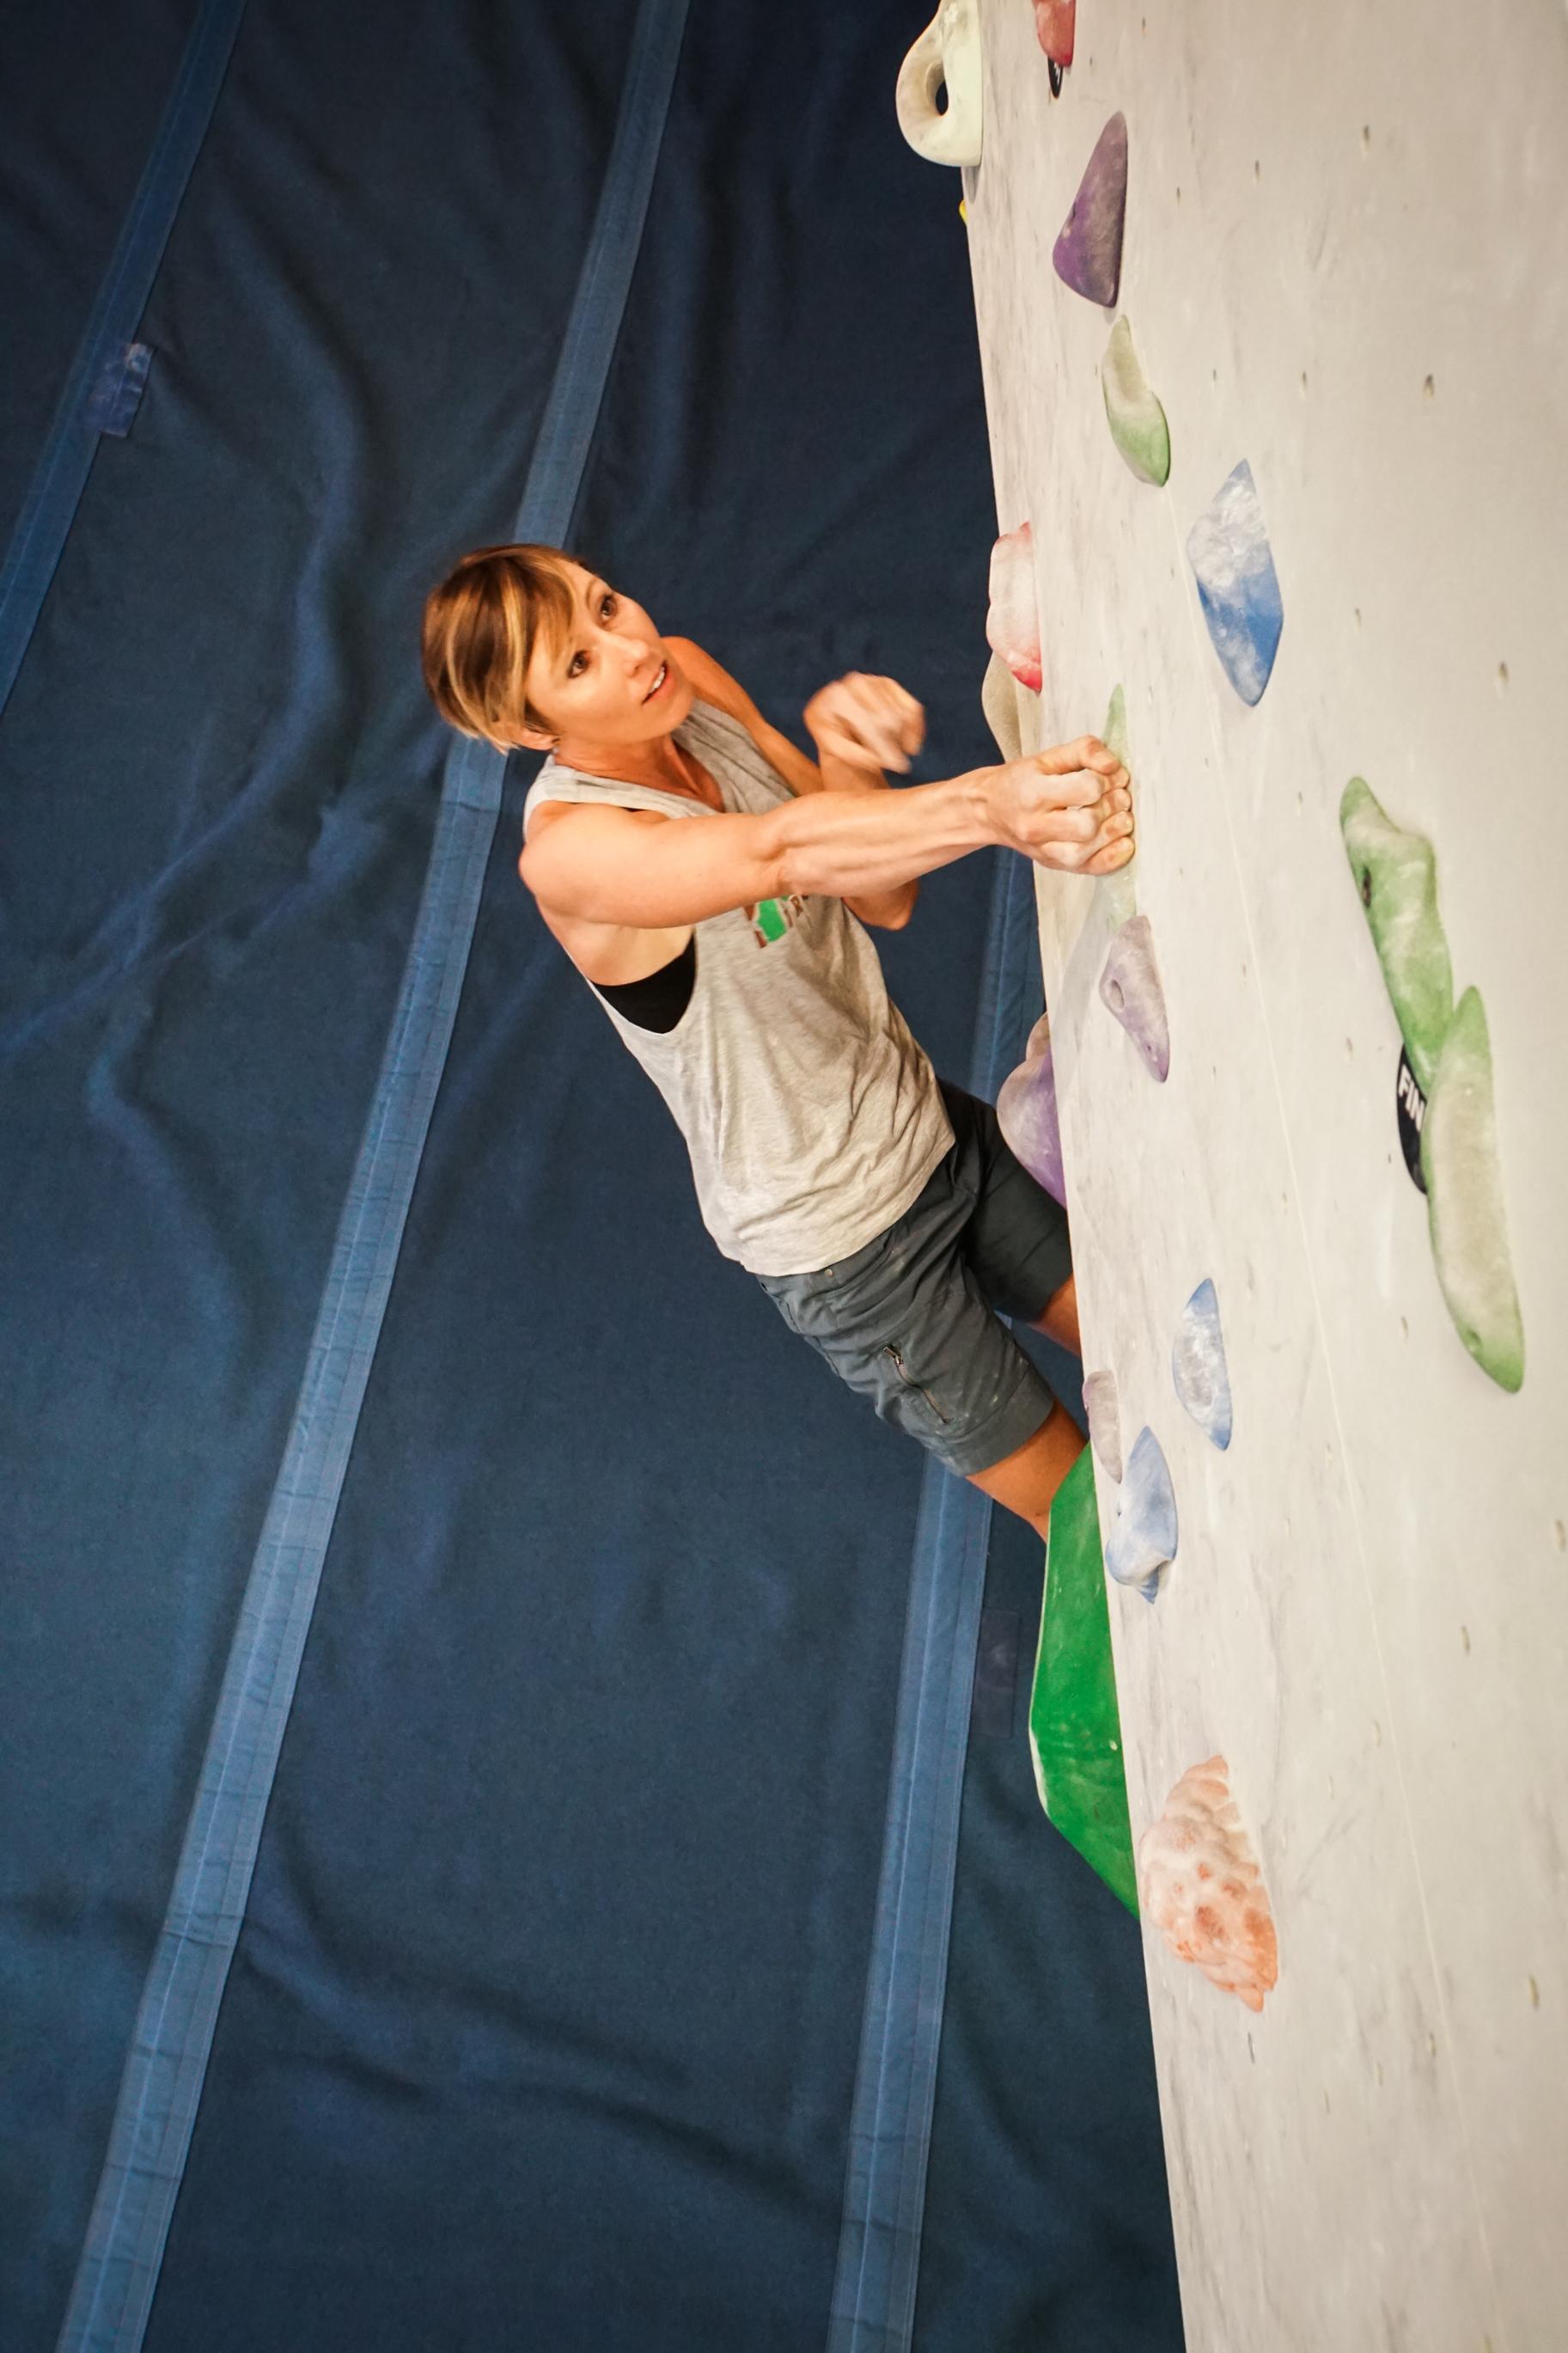 Heidi bouldering at the Spire Climbing Center.